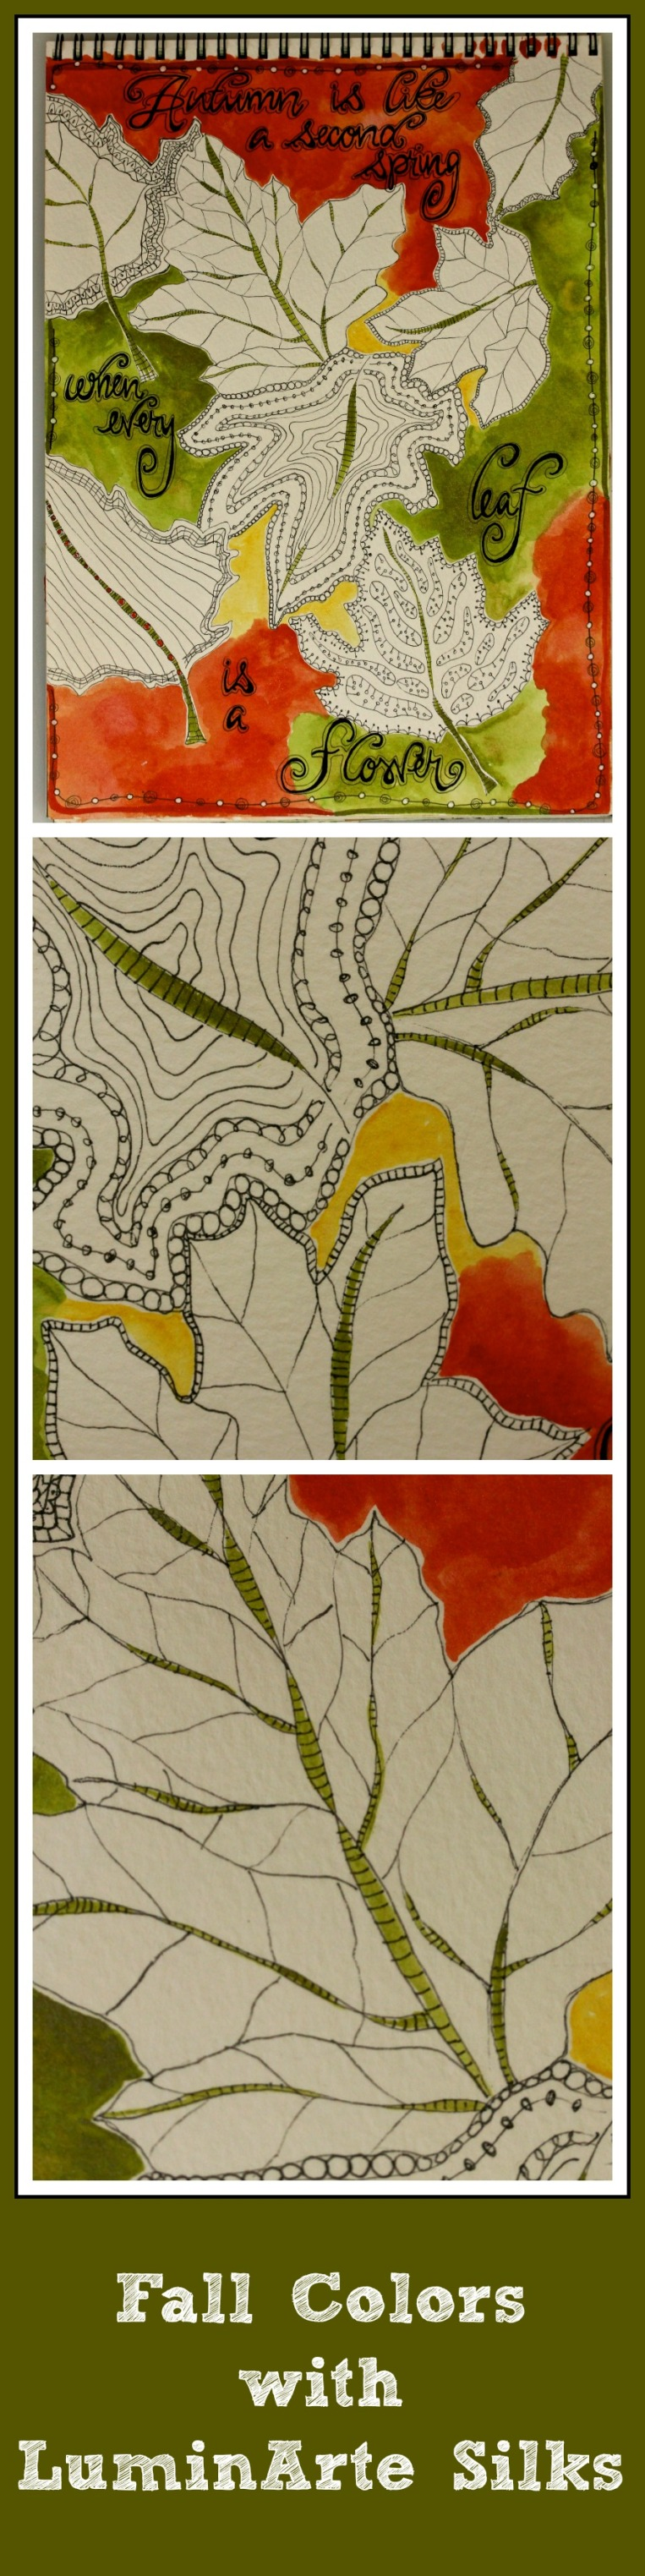 Fall Colors w/LuminArte Silks